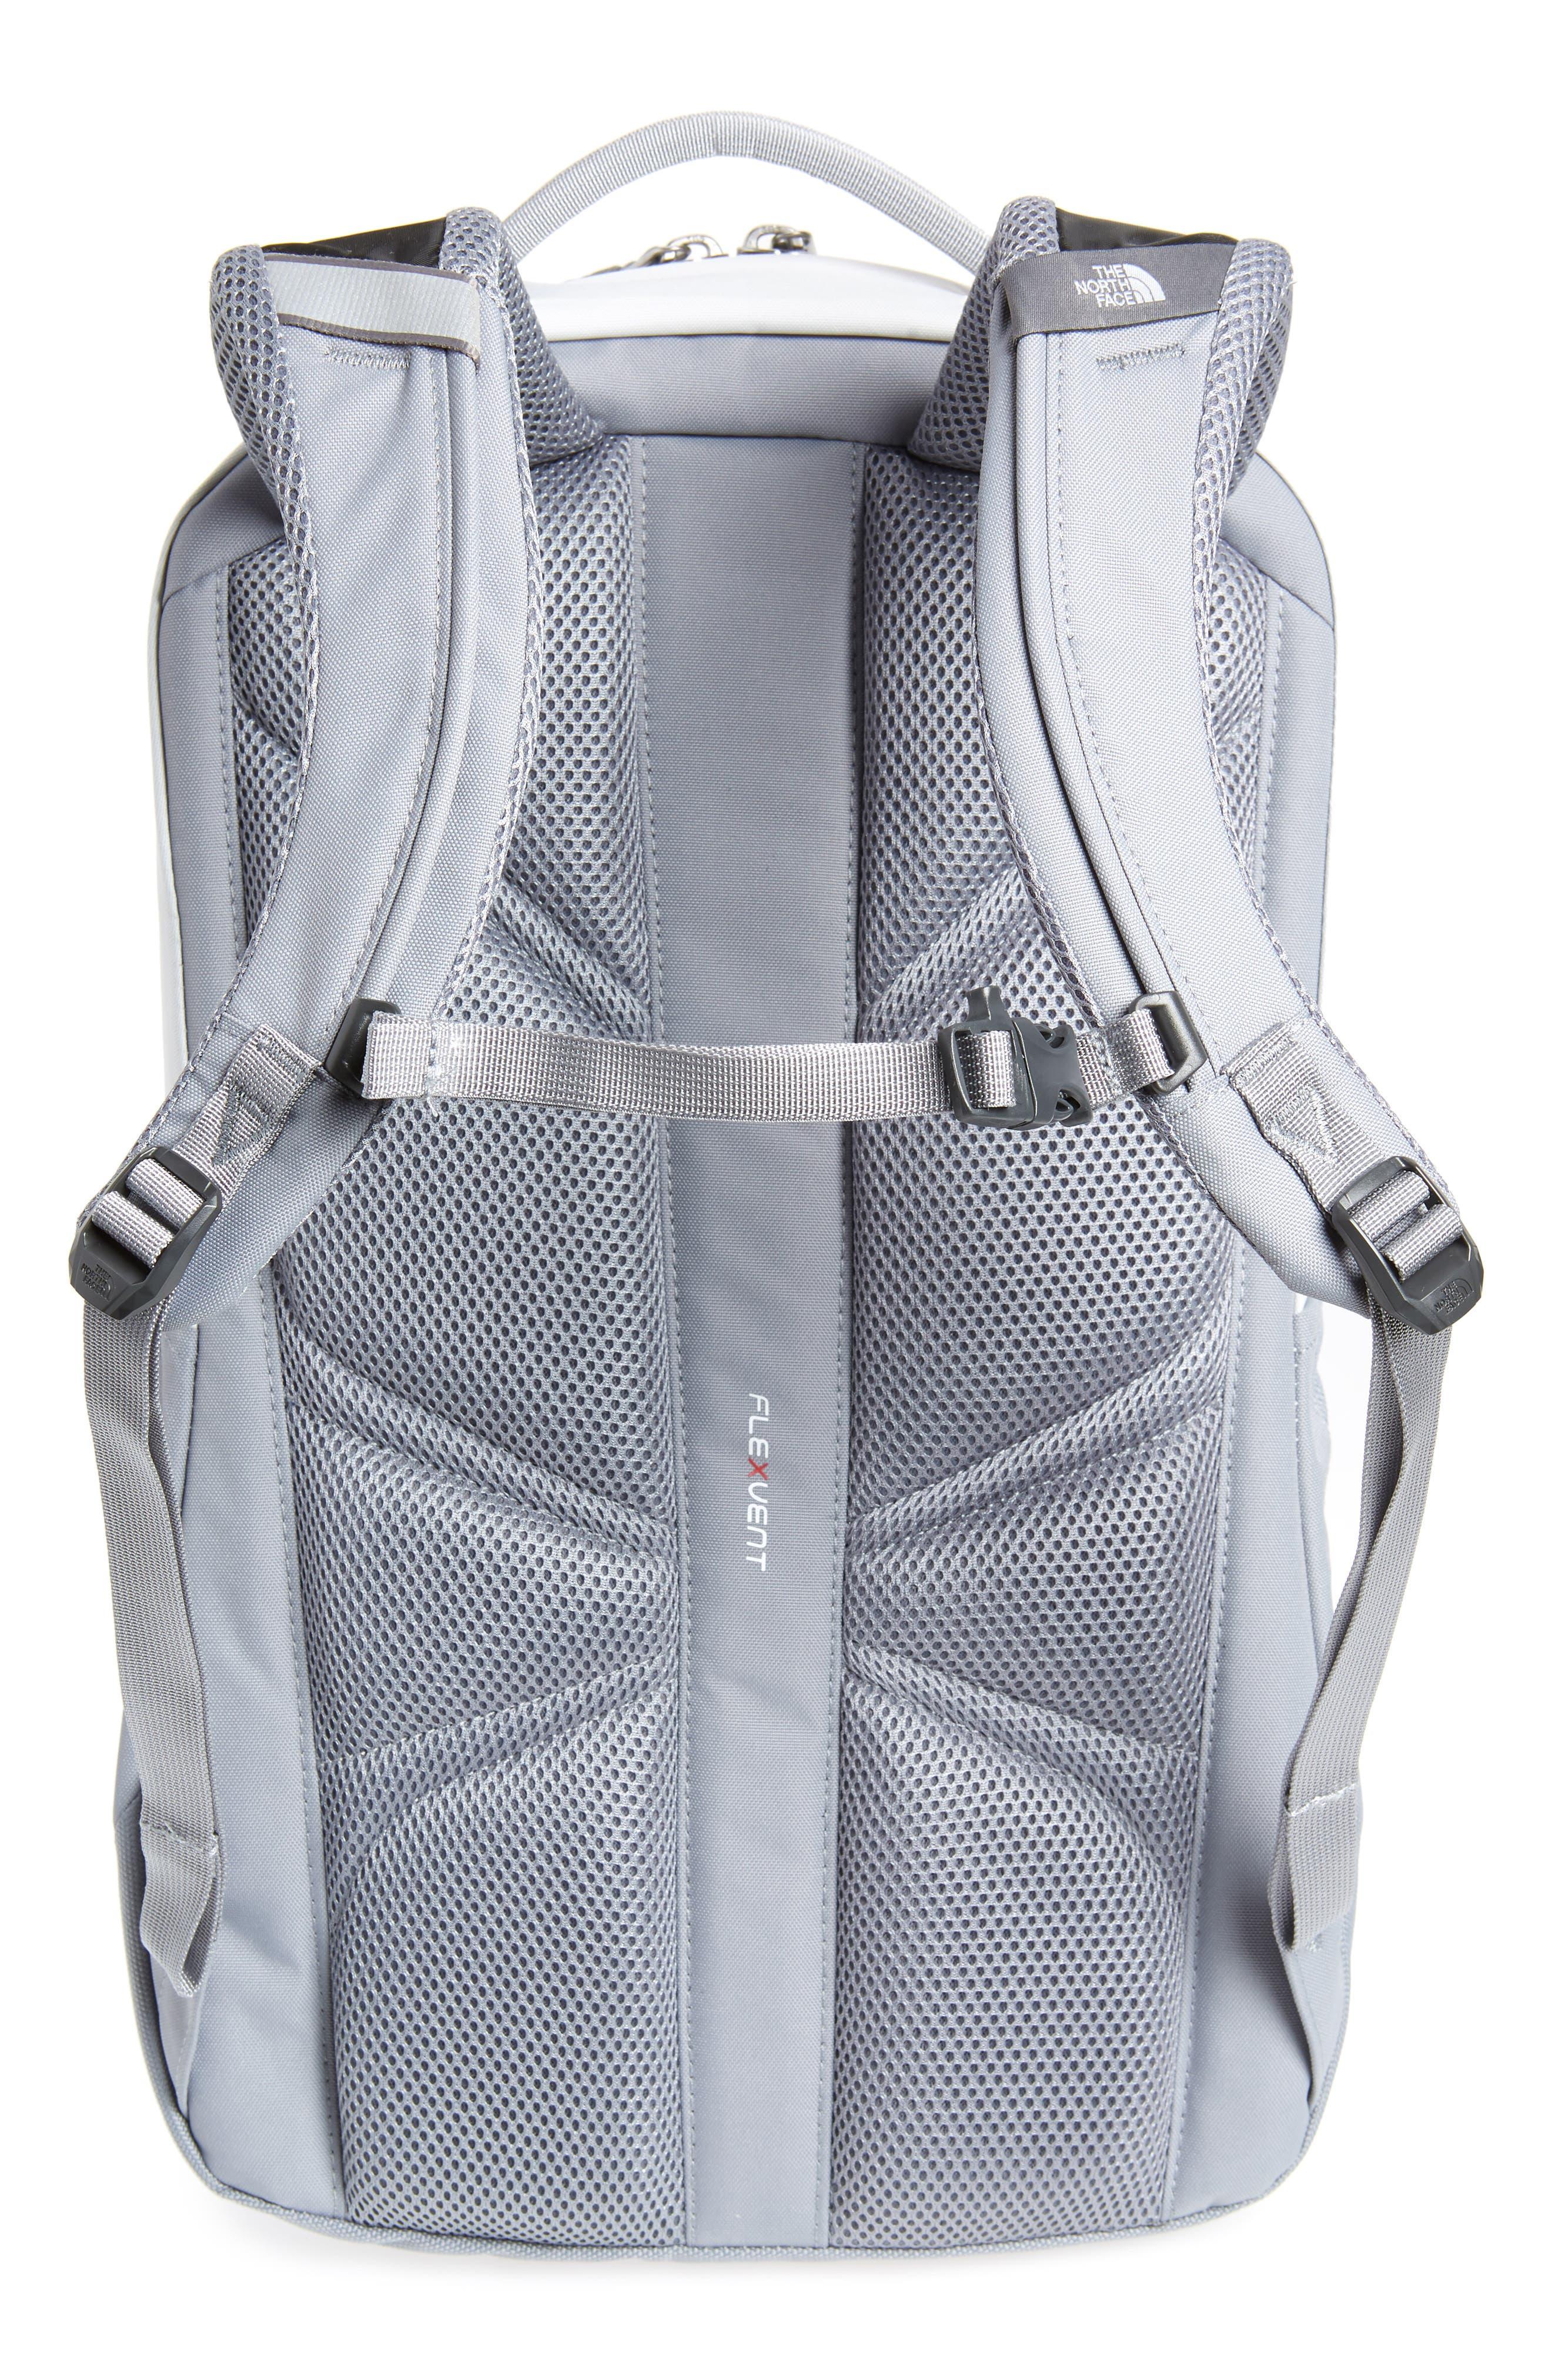 Vault Backpack,                             Alternate thumbnail 2, color,                             Tin Grey/ Mid Grey